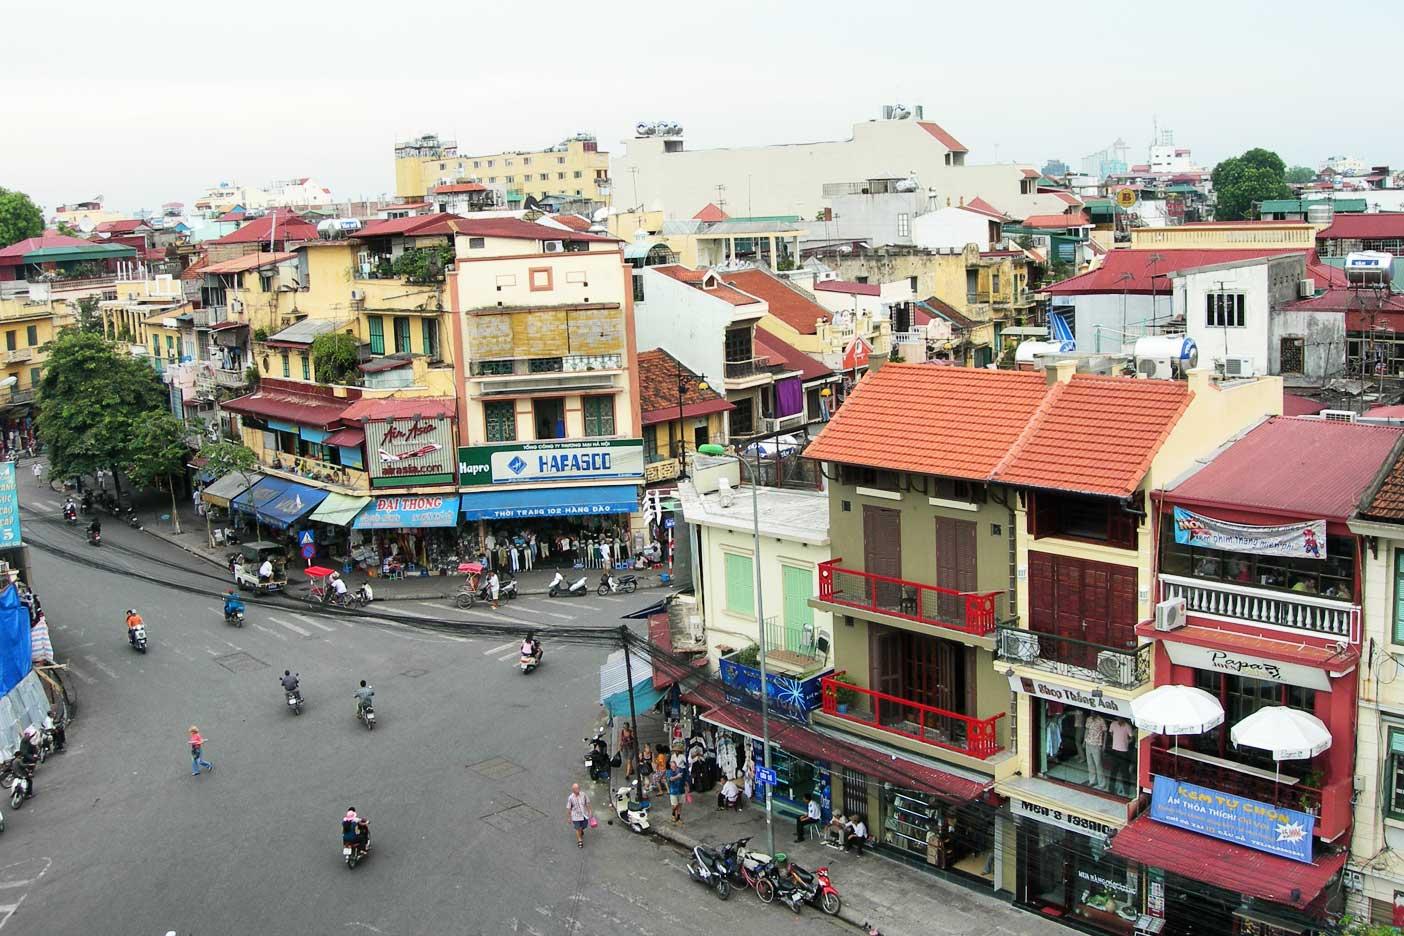 Rooftop view overlooking the shop-lined streets of Hanoi, Vietnam